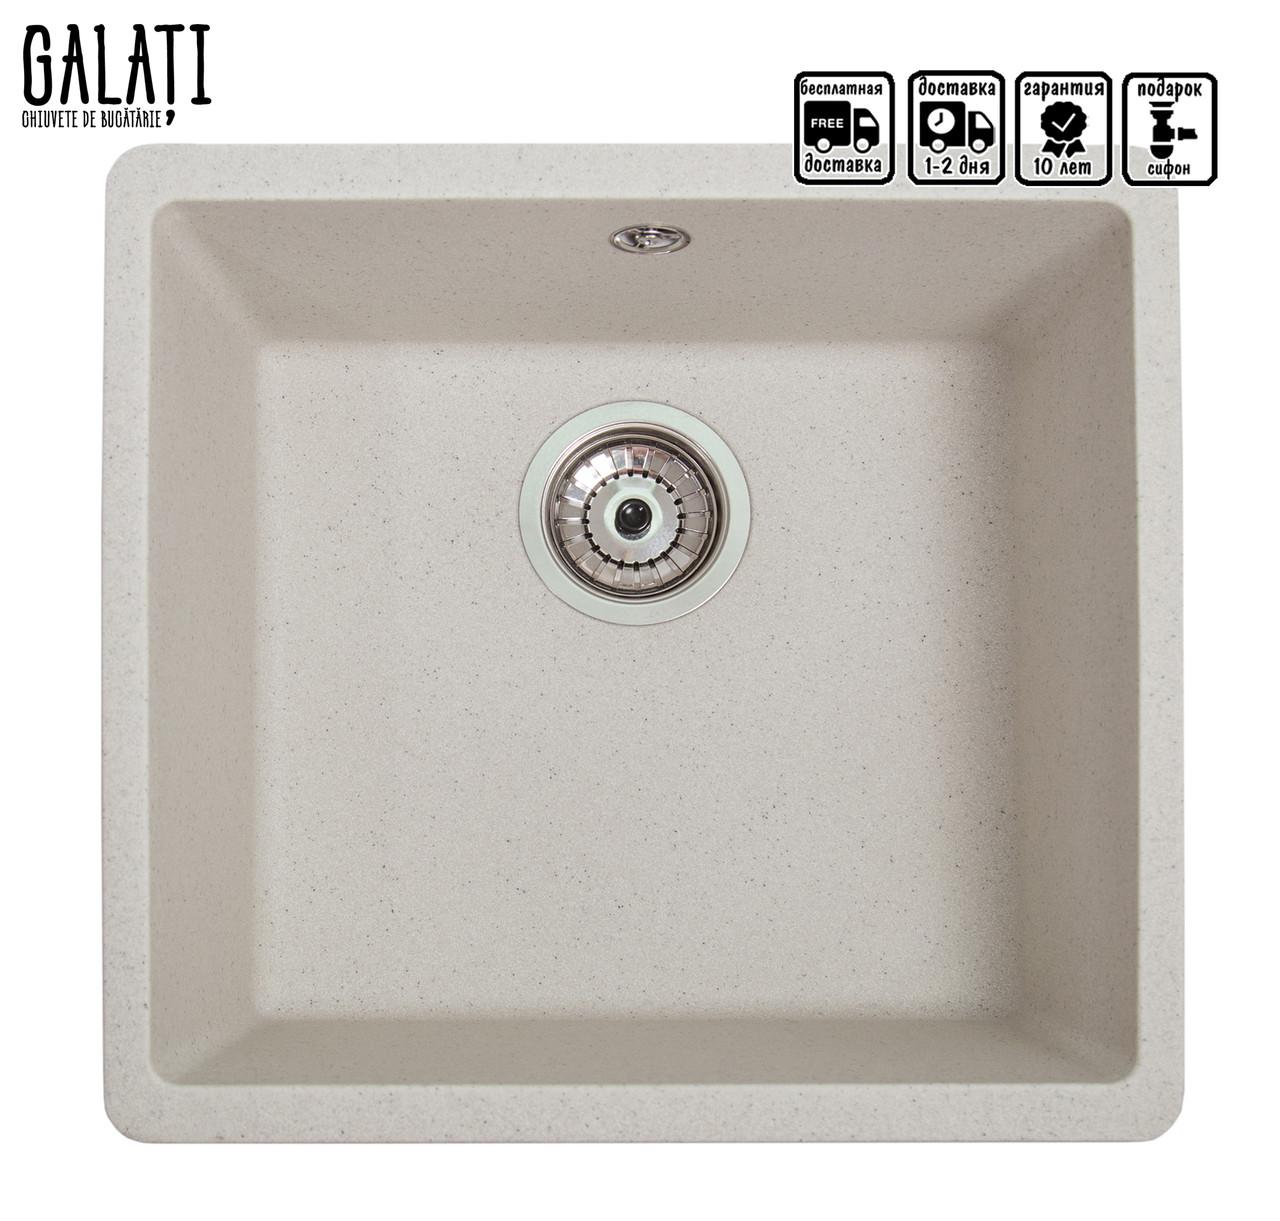 Кухонная мойка гранитная Mira U-400 (440*420*200) Biela (101) ТМ Galati